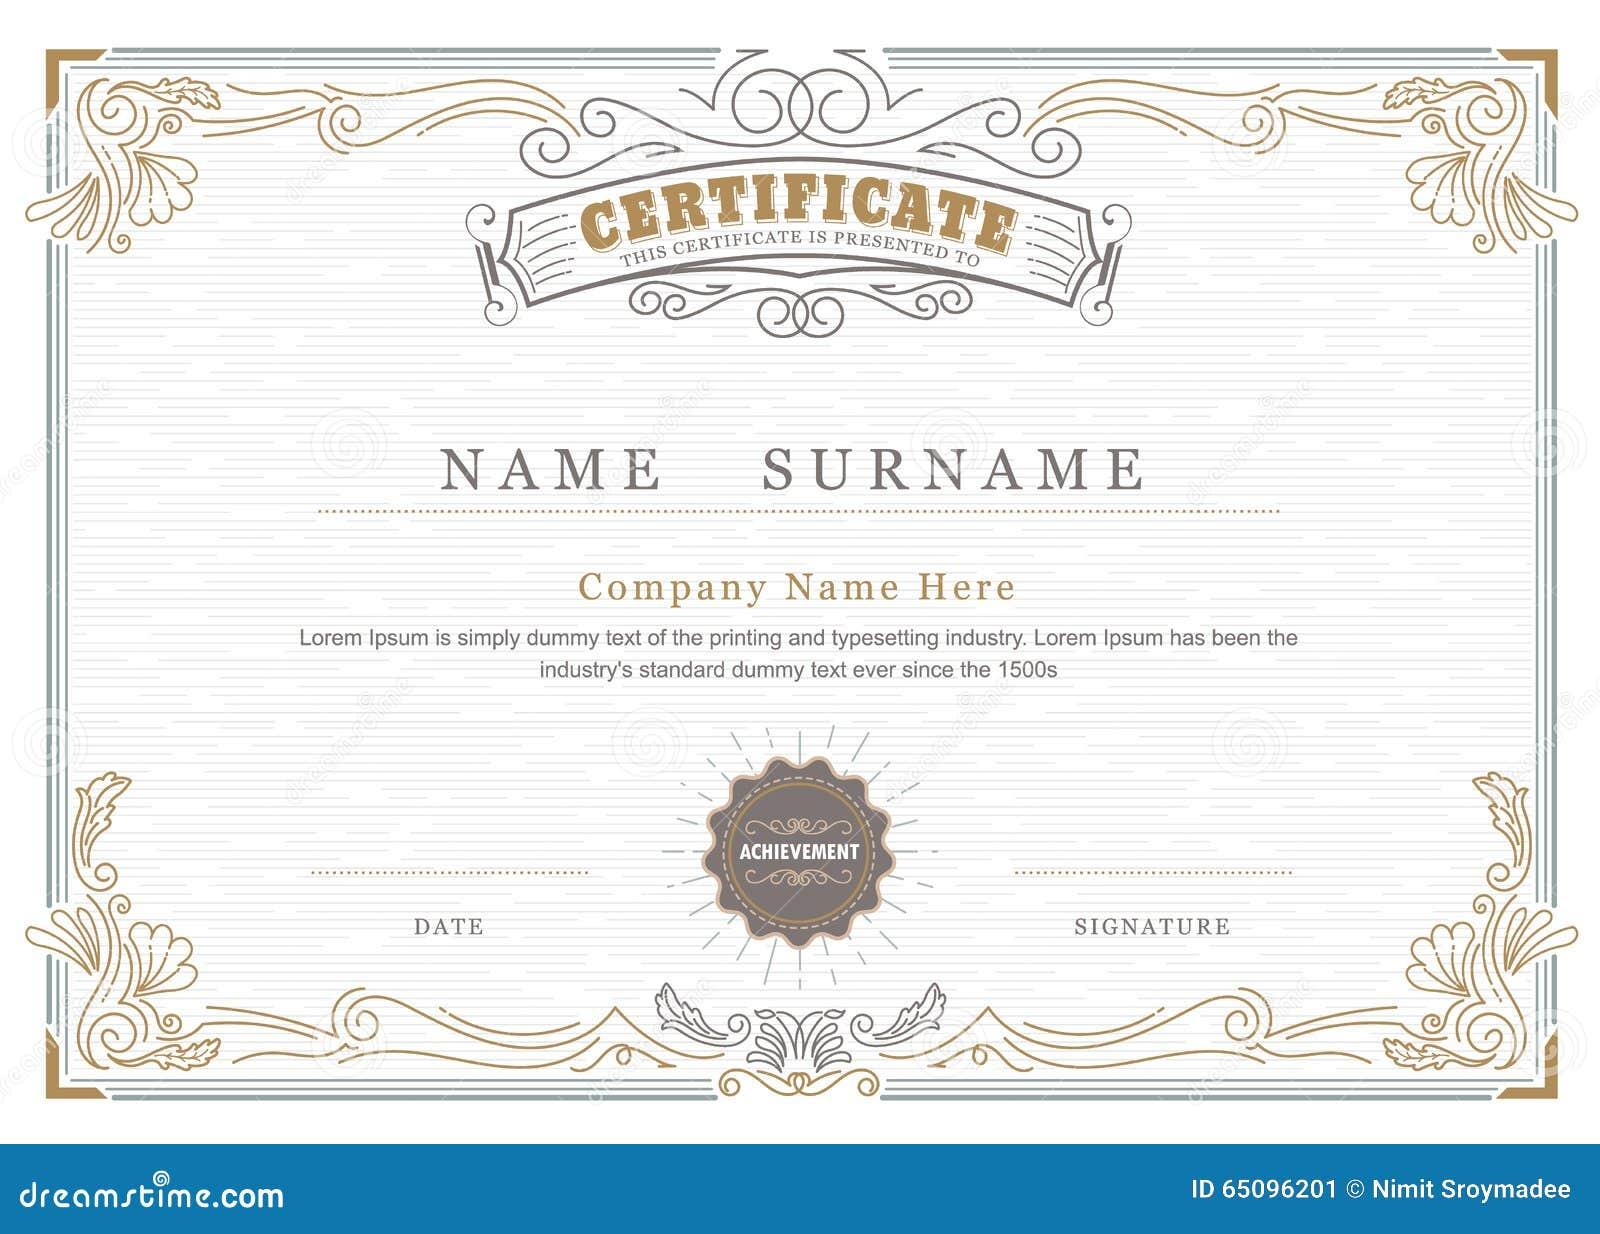 Achievement Certificate Elegant Flourishes Frame Vintage ...